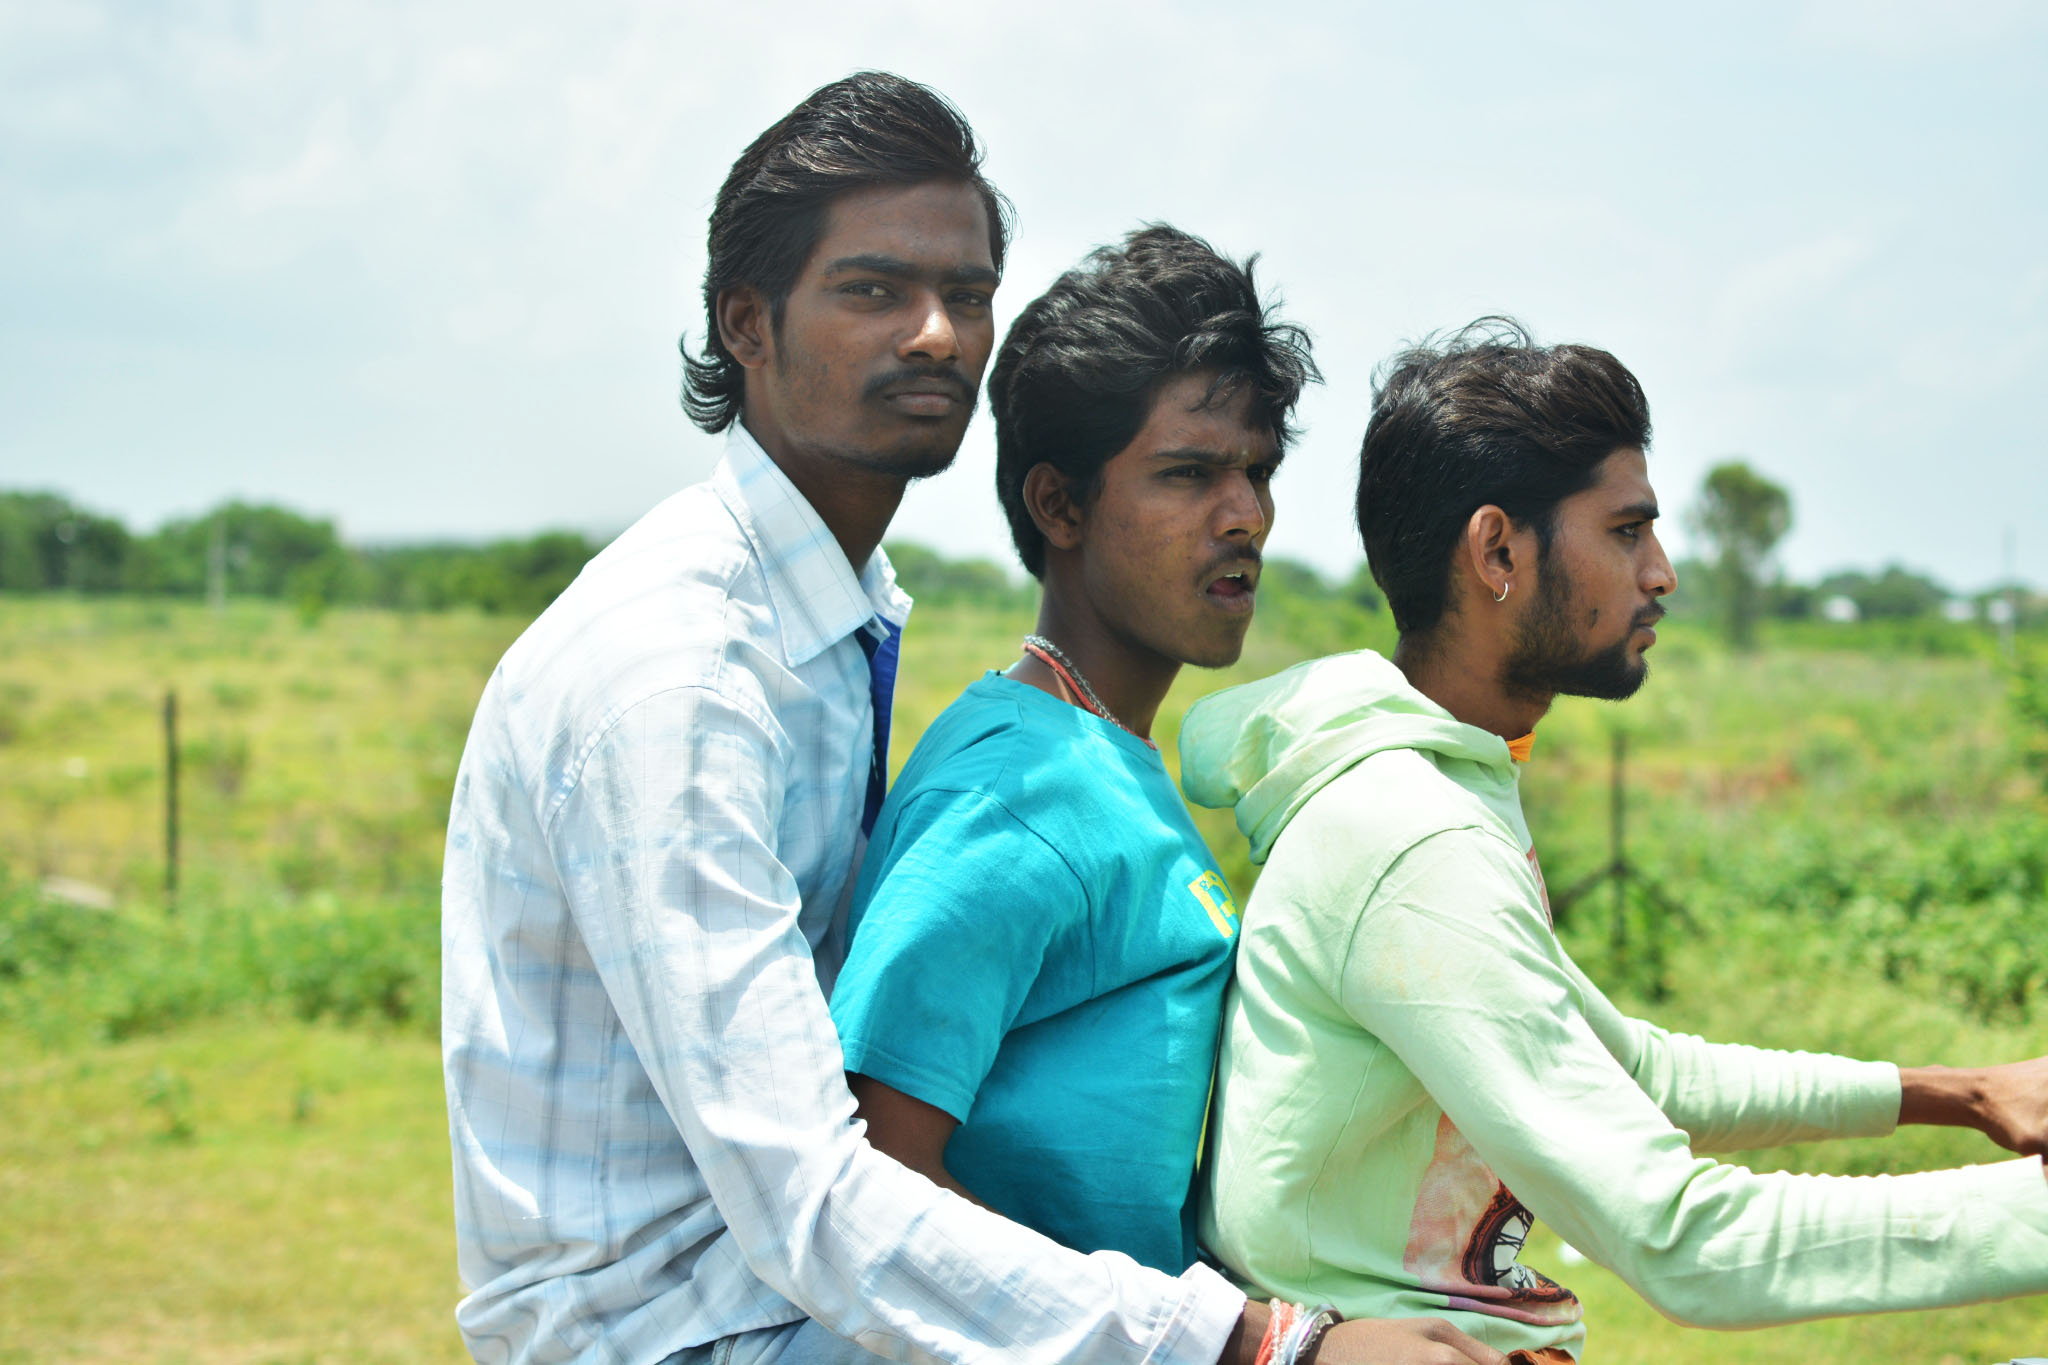 india - boyz on moped.jpg